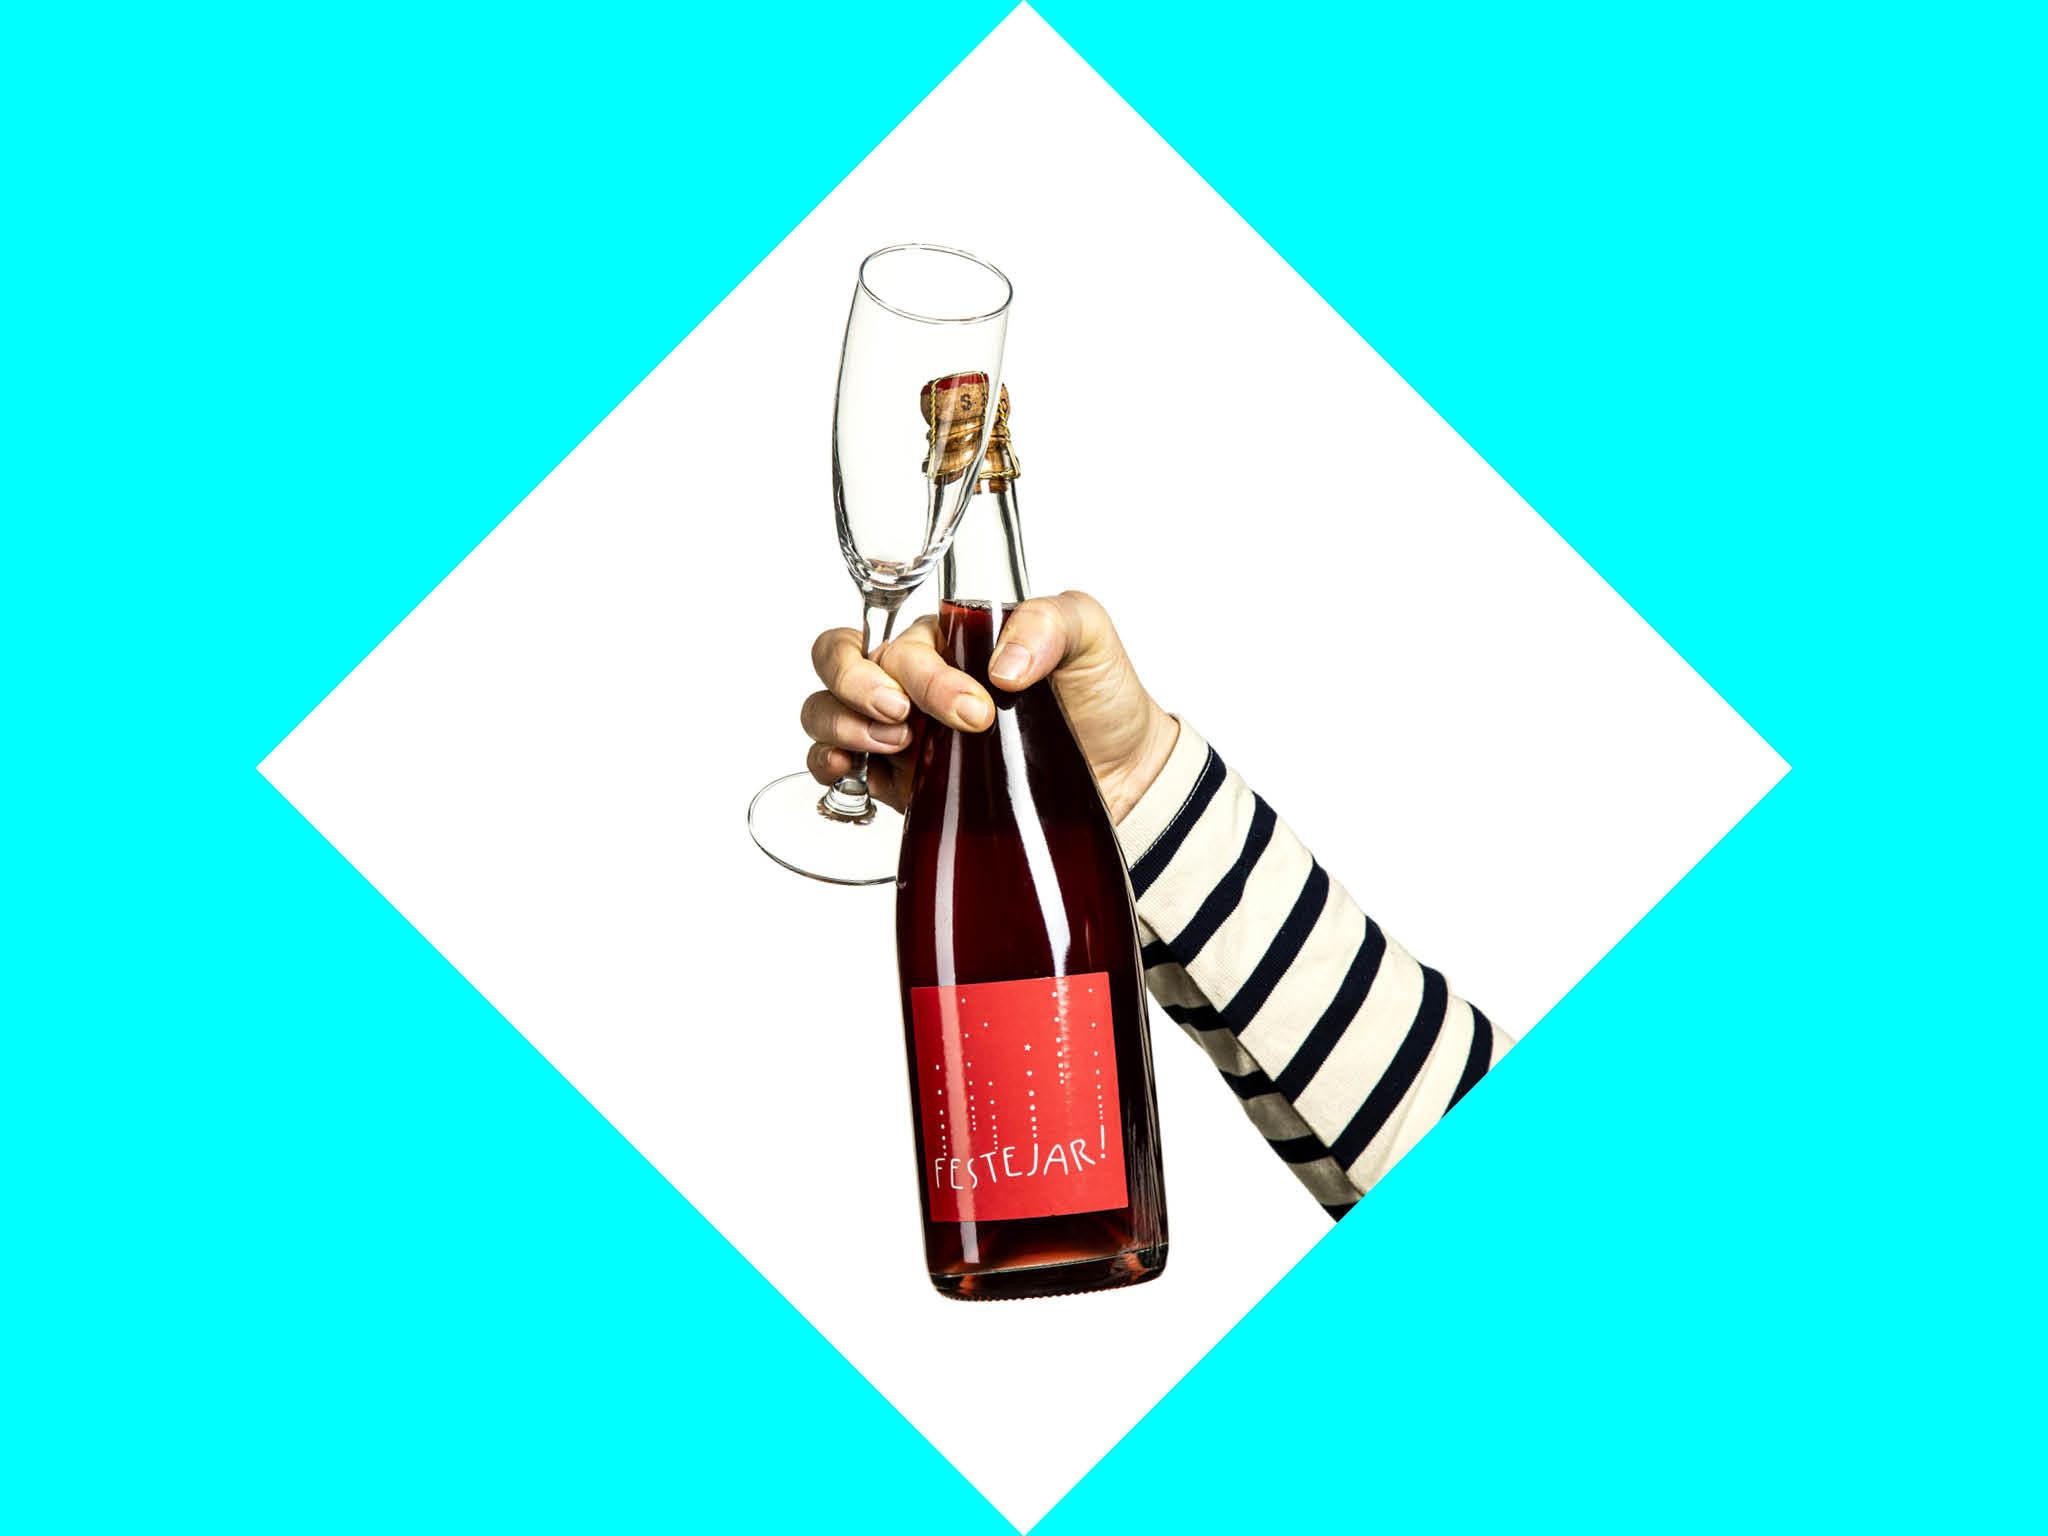 natural wine, festejar